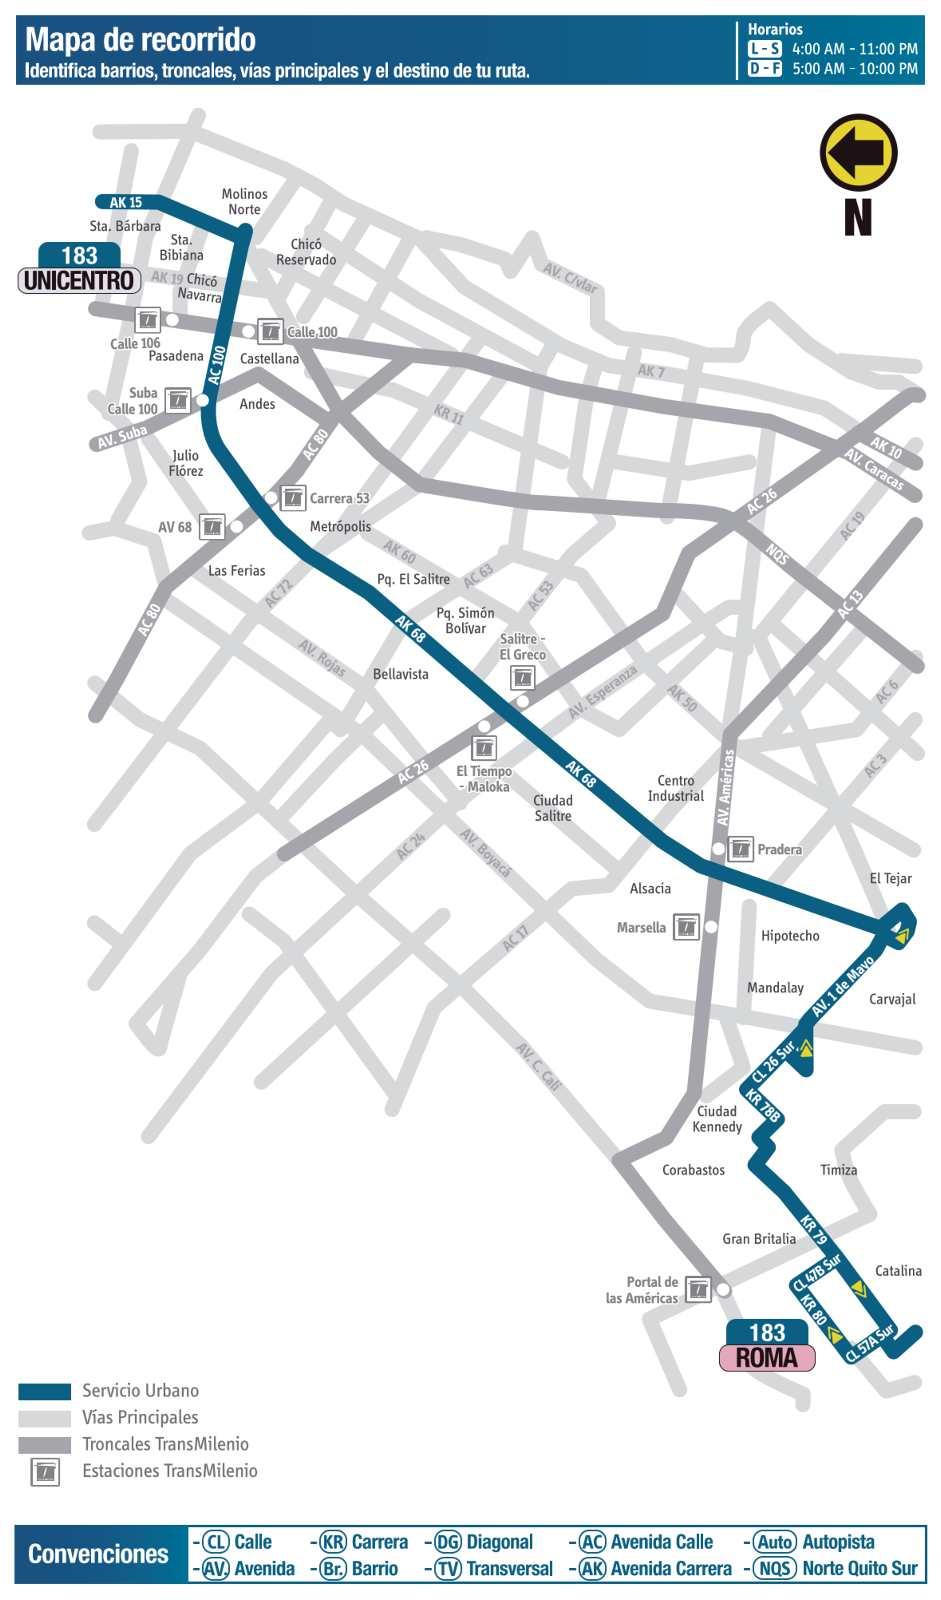 Ruta SITP: 183 Roma ↔ Unicentro (mapa)